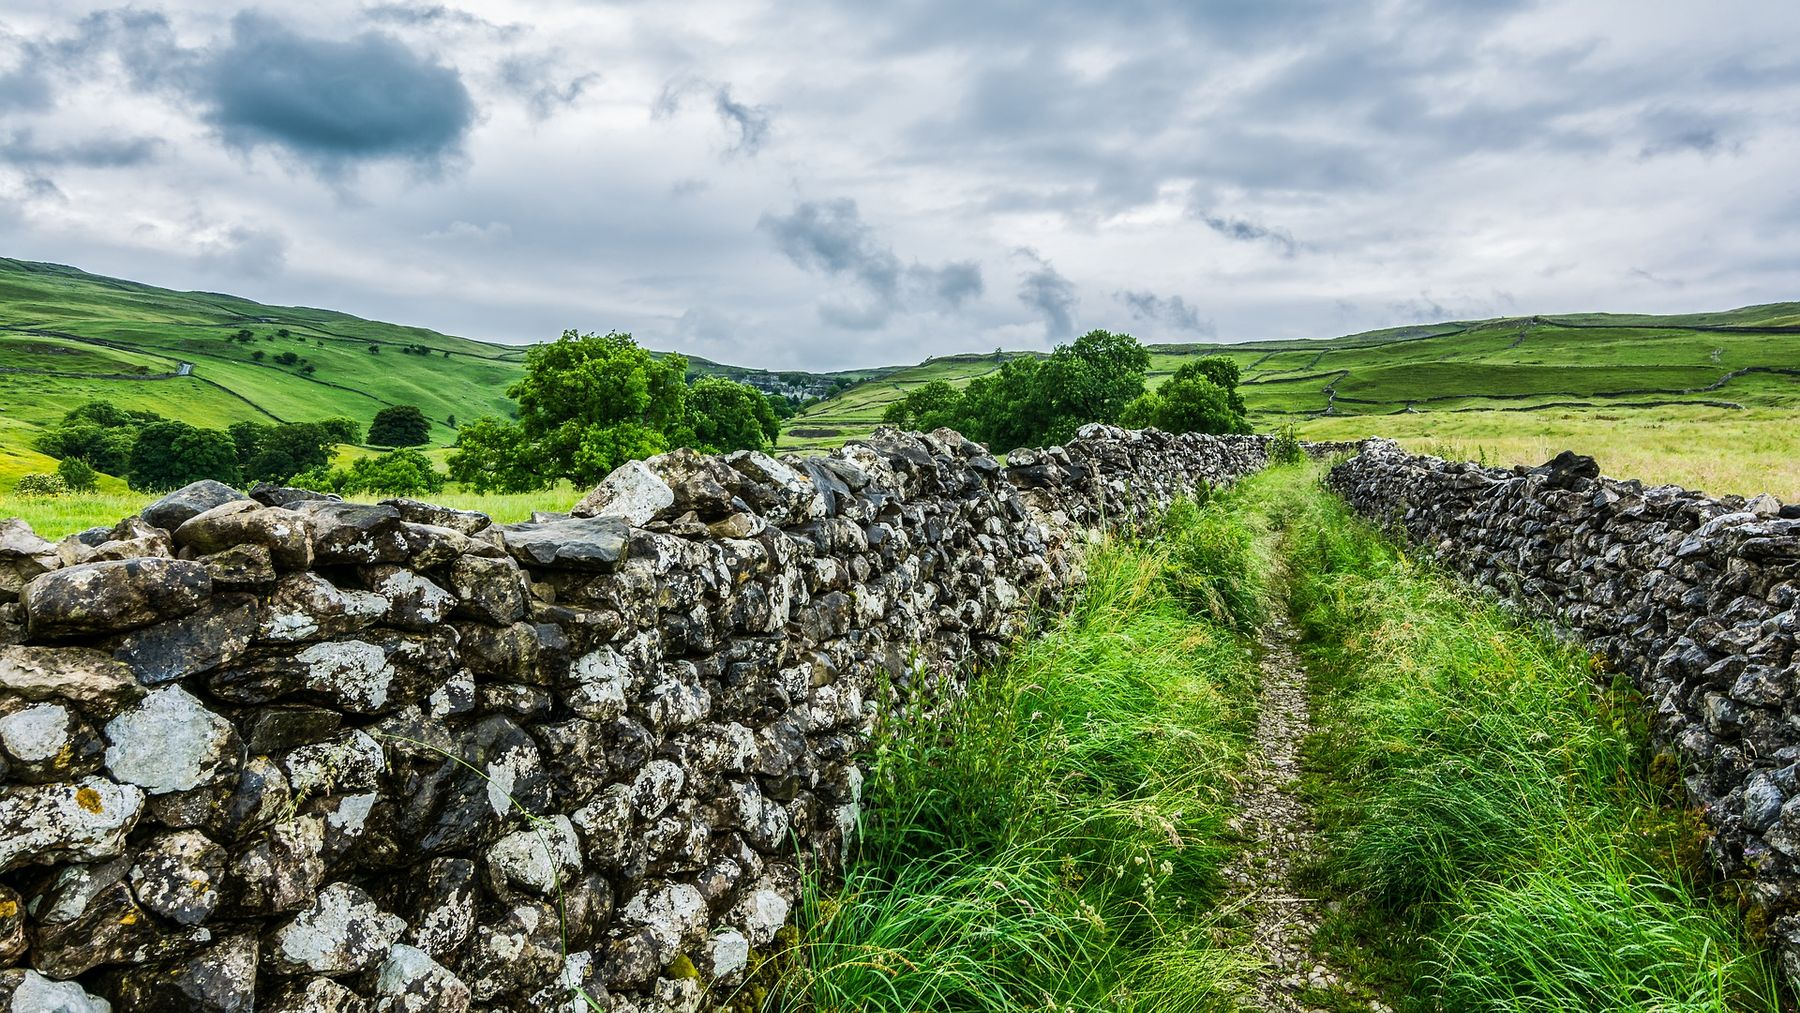 Stone wall near Malham, Yorkshire